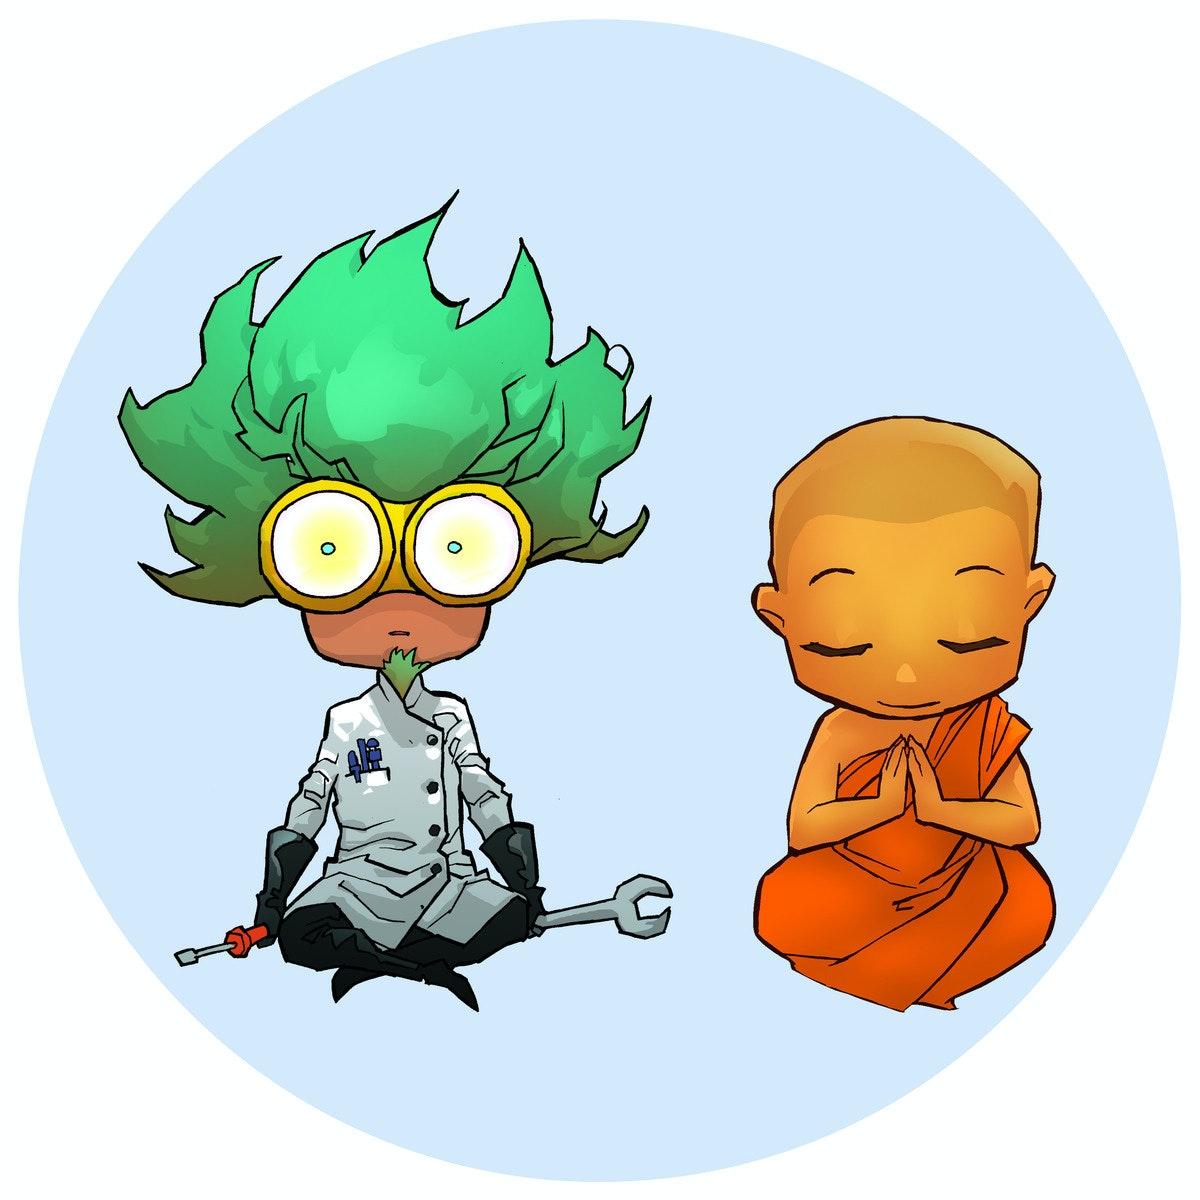 De-Mystifying Mindfulness